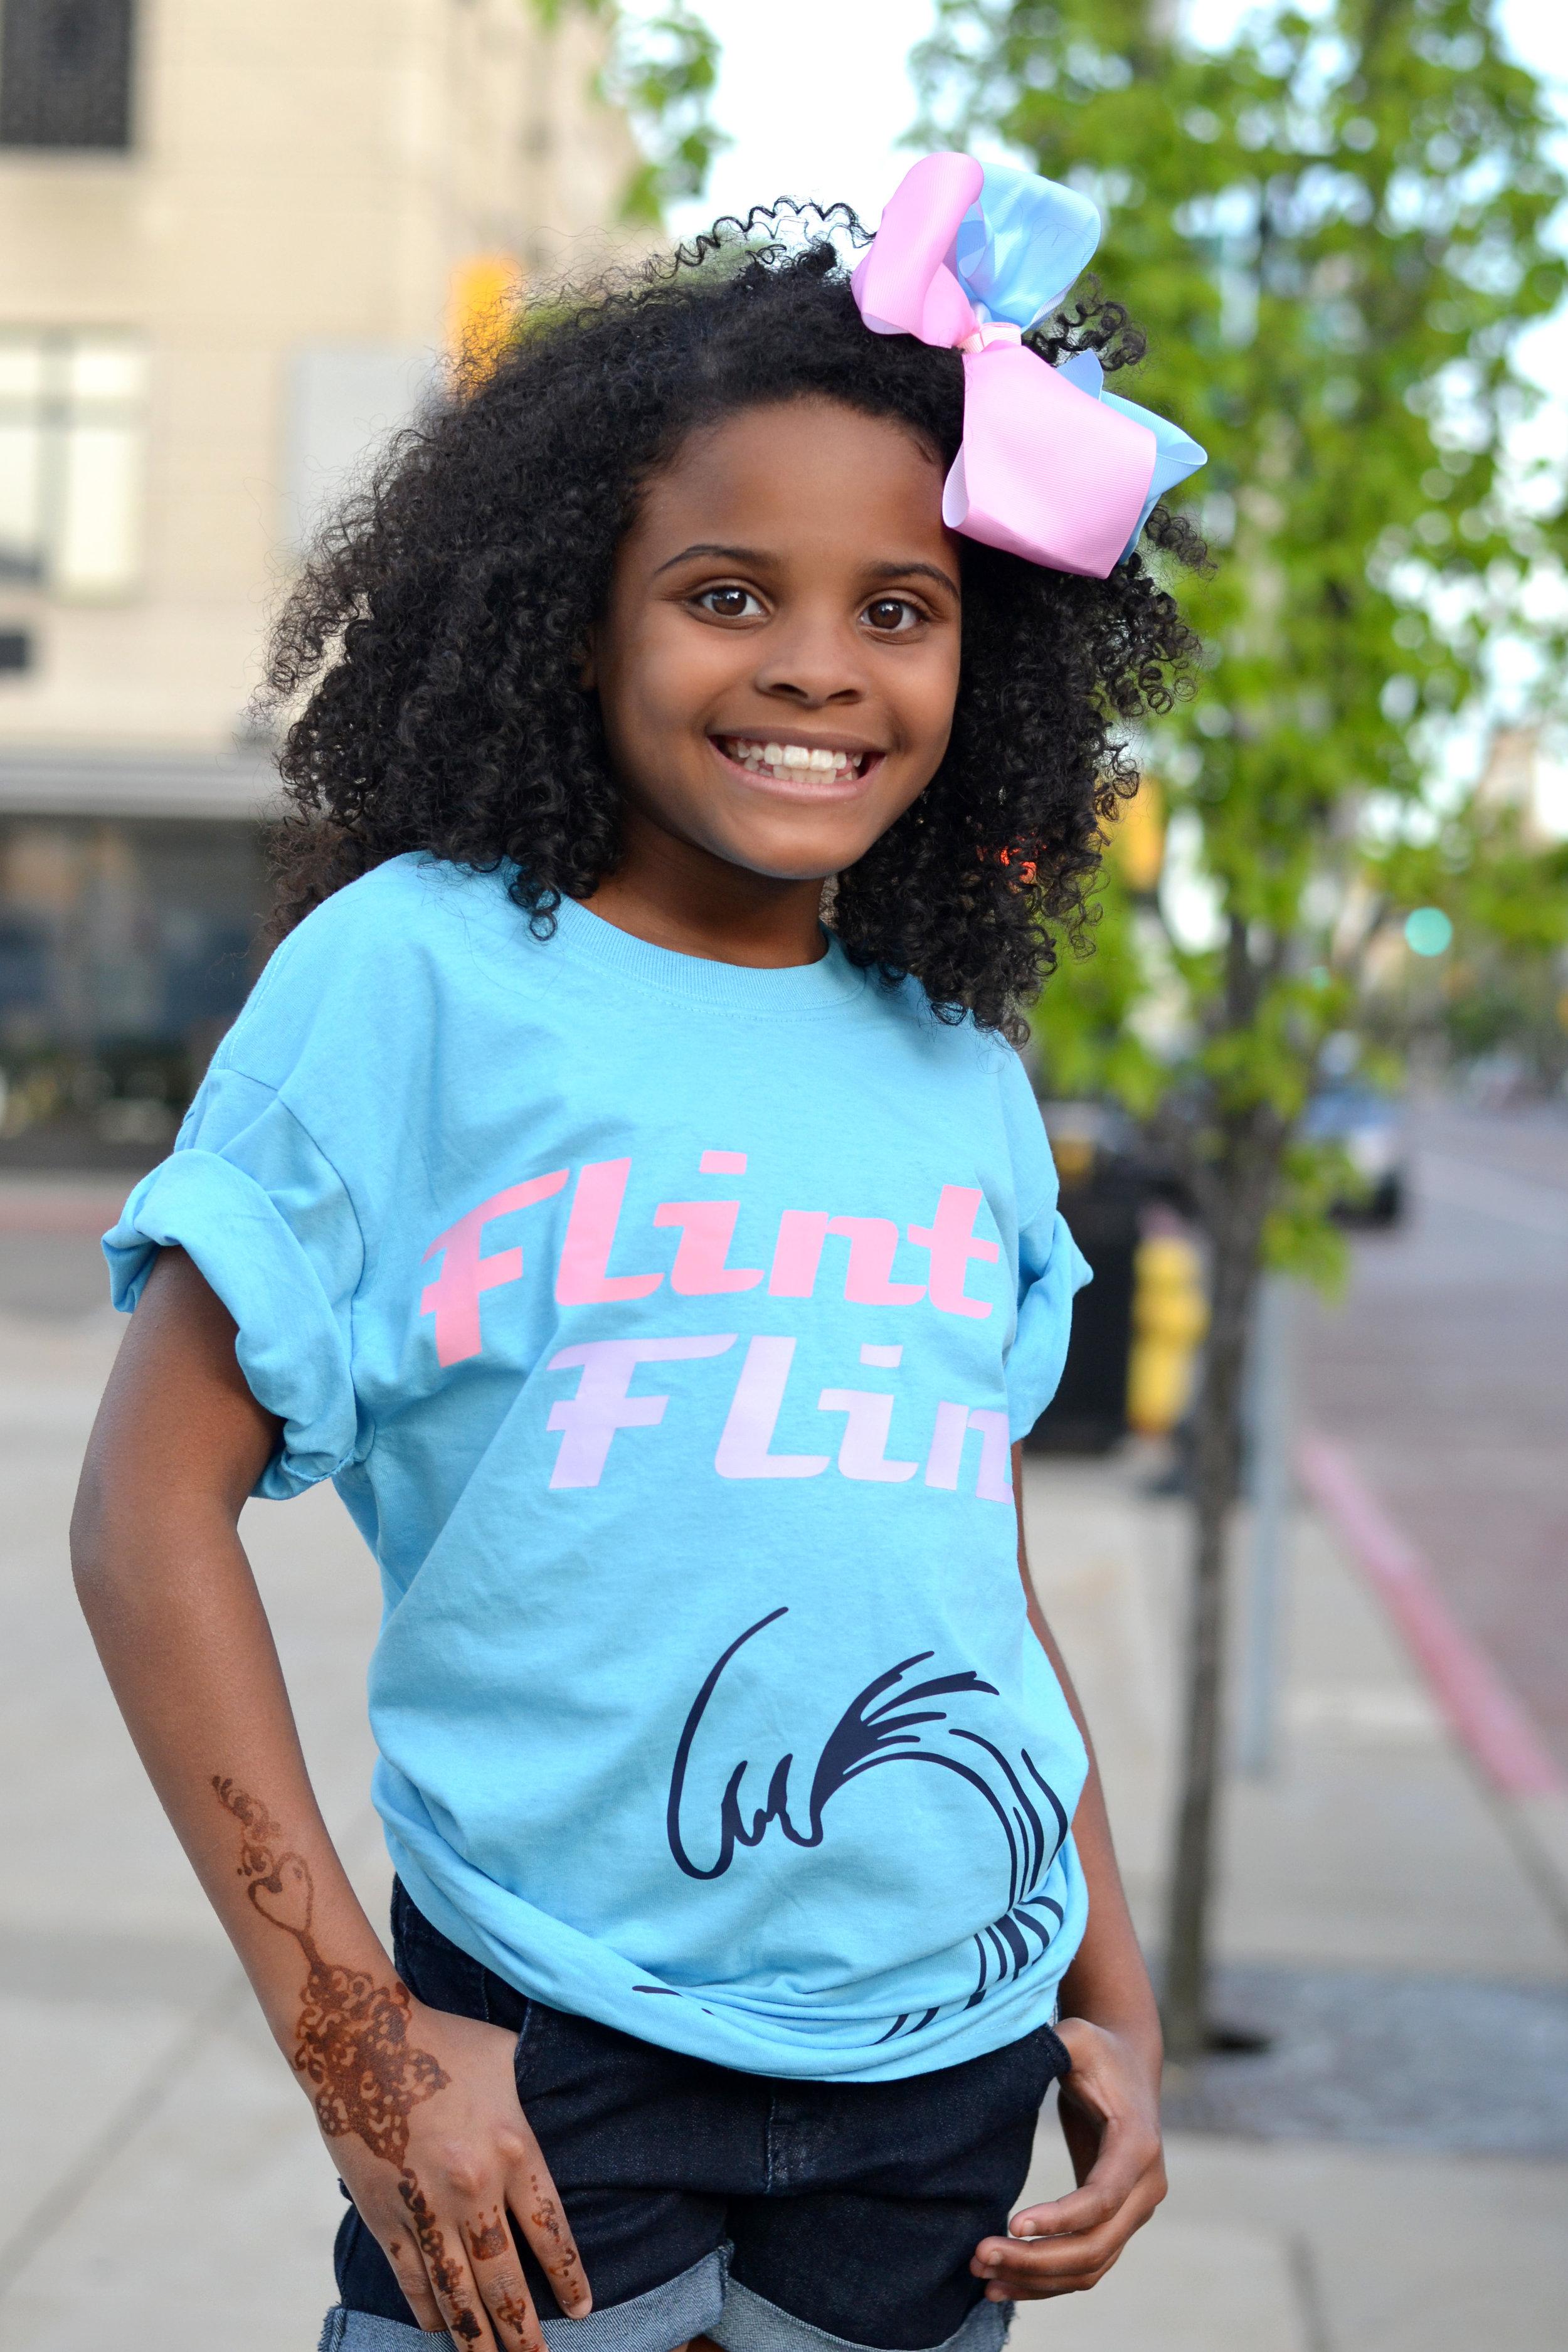 Little Ms. Flint - Mari Copeny rocking our wavy Flint Tour T